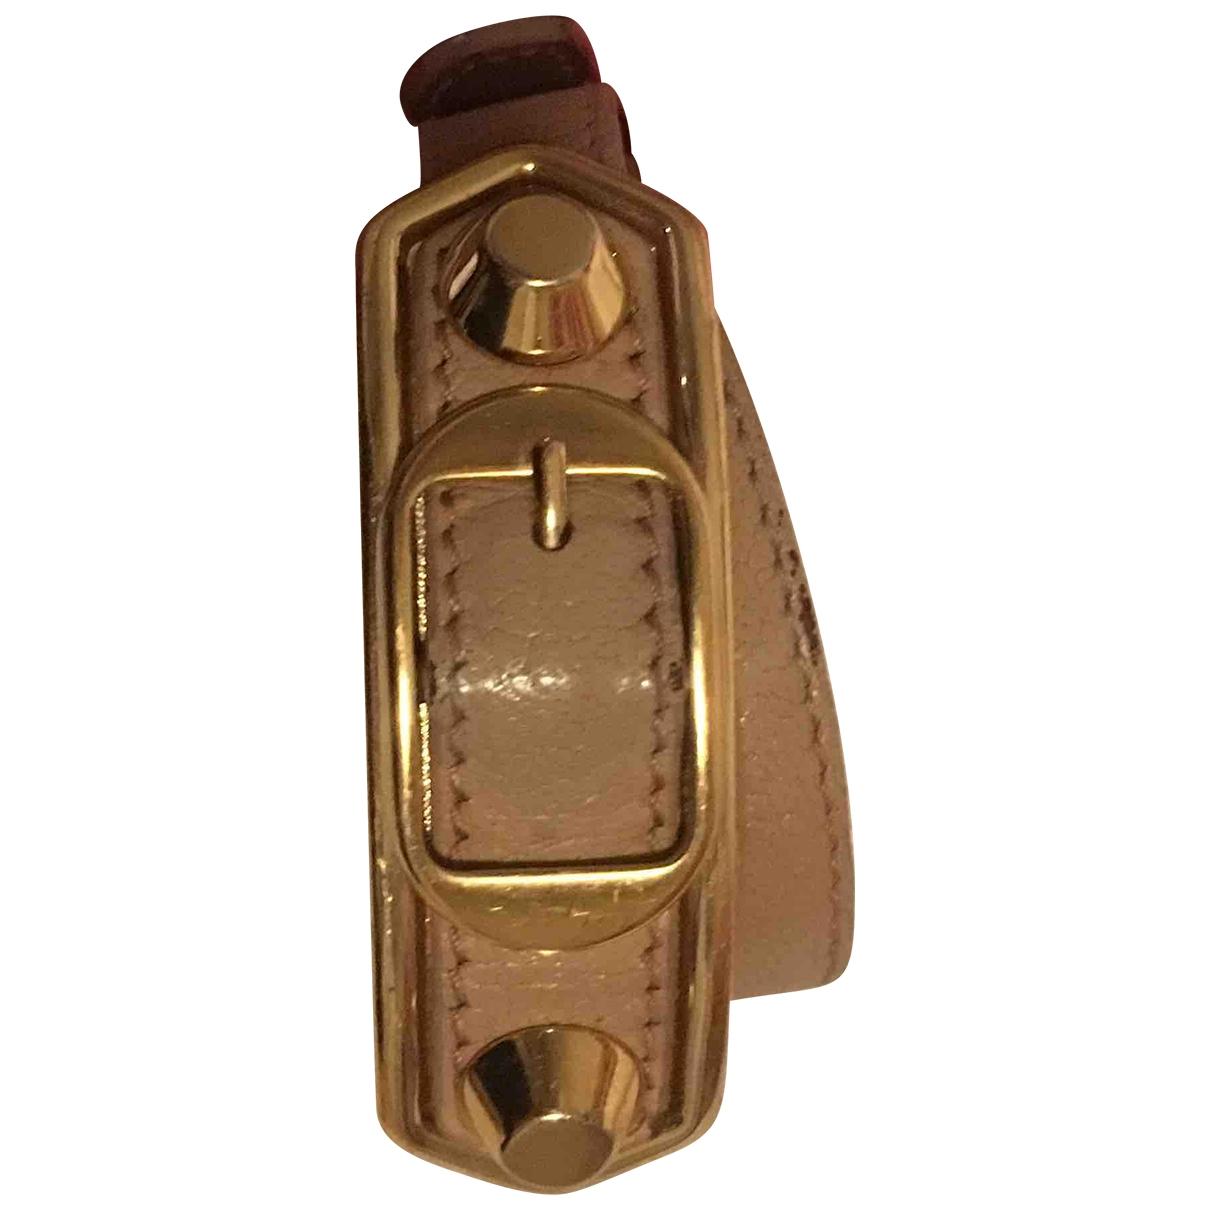 Balenciaga \N Beige Leather bracelet for Women \N